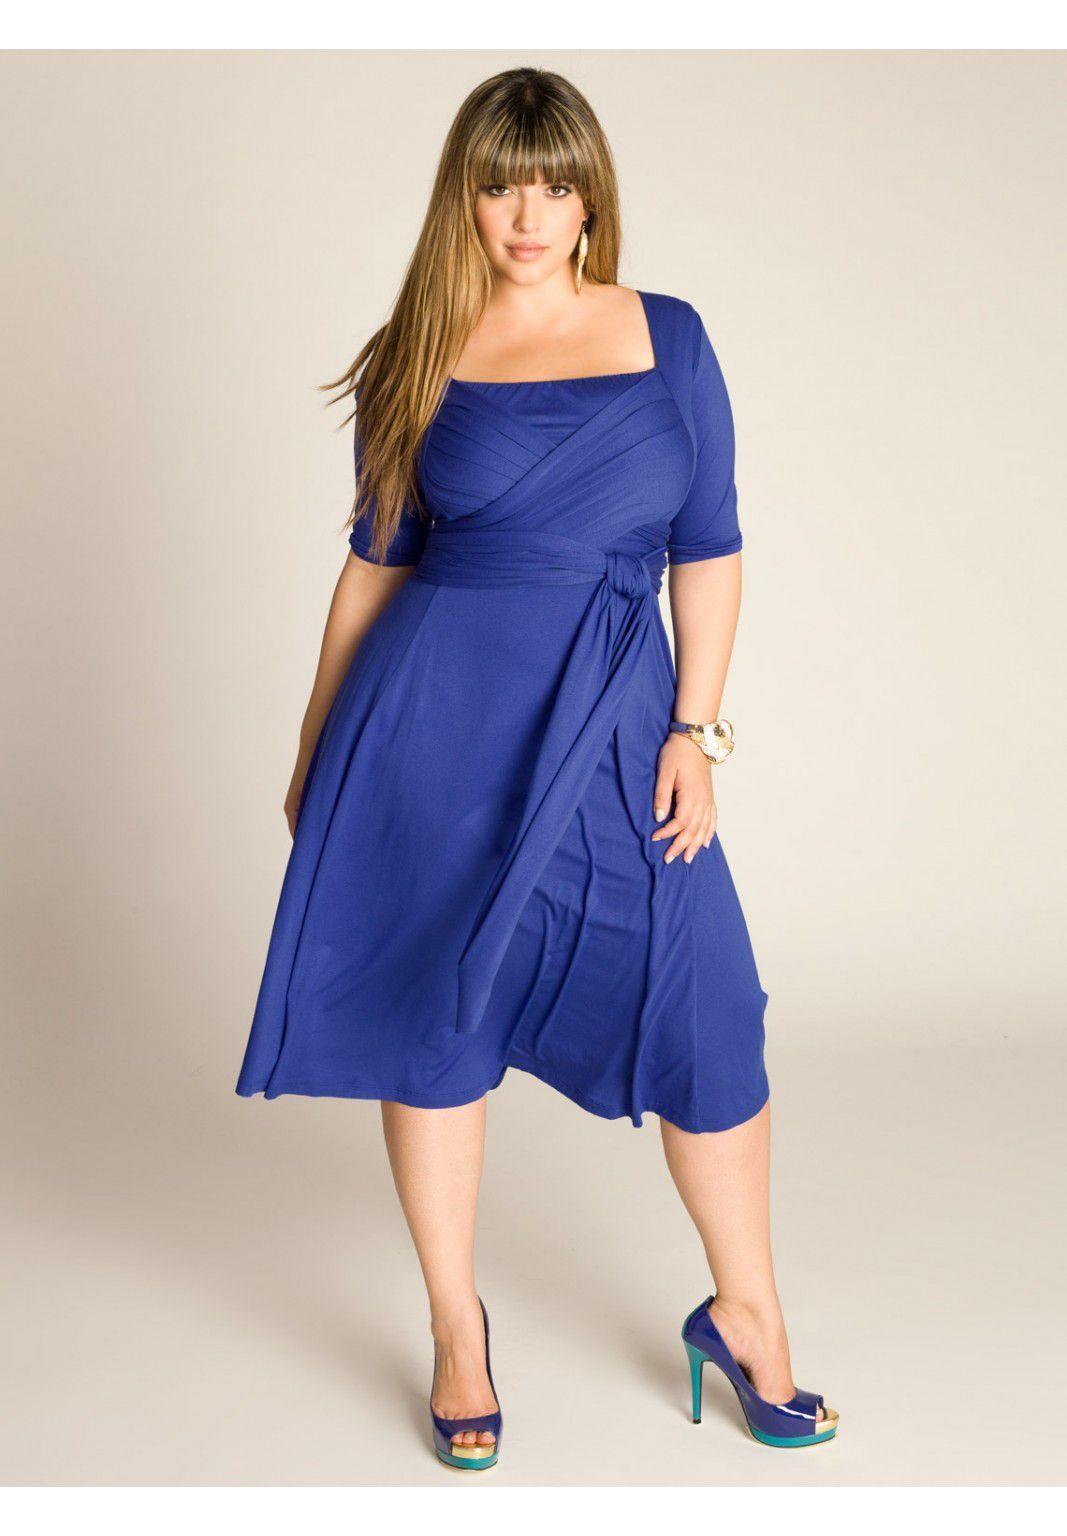 Plus Size Tiffany Dress in Dazzling Blue | Plus Size Work Dresses ...